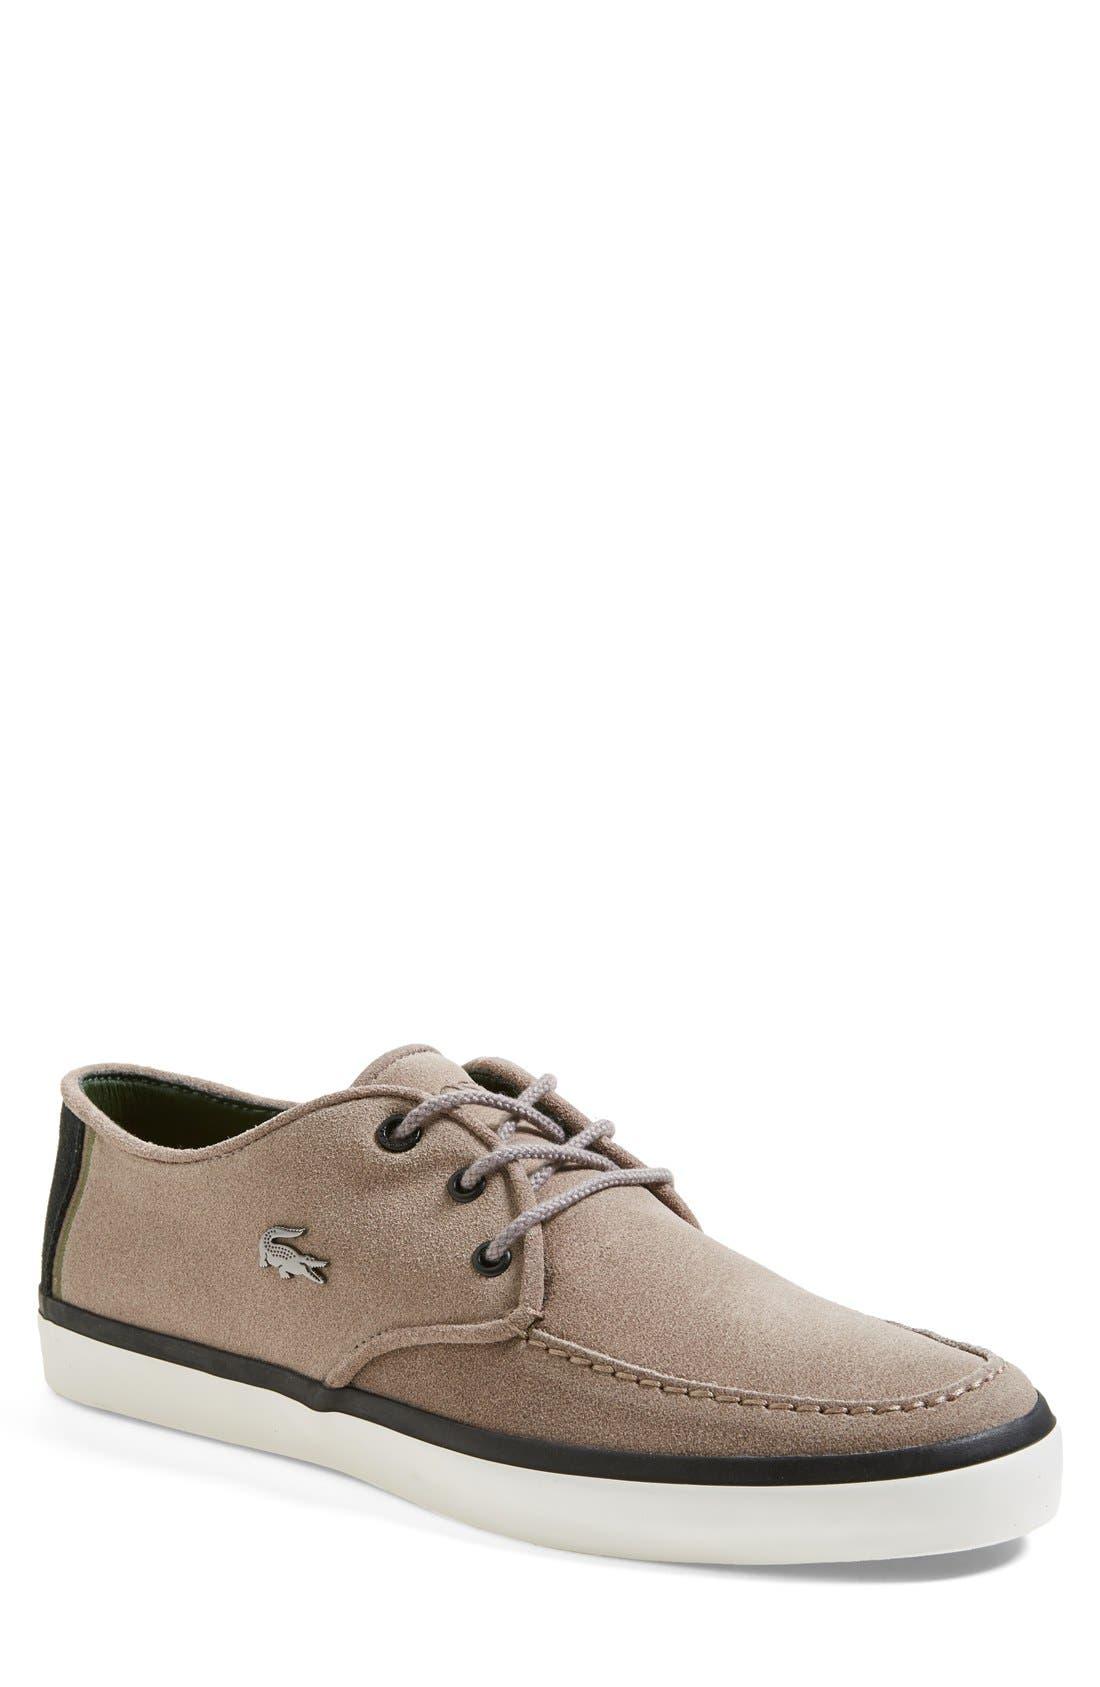 Alternate Image 1 Selected - Lacoste 'Sevrin 4' Sneaker (Men) (Online Only)